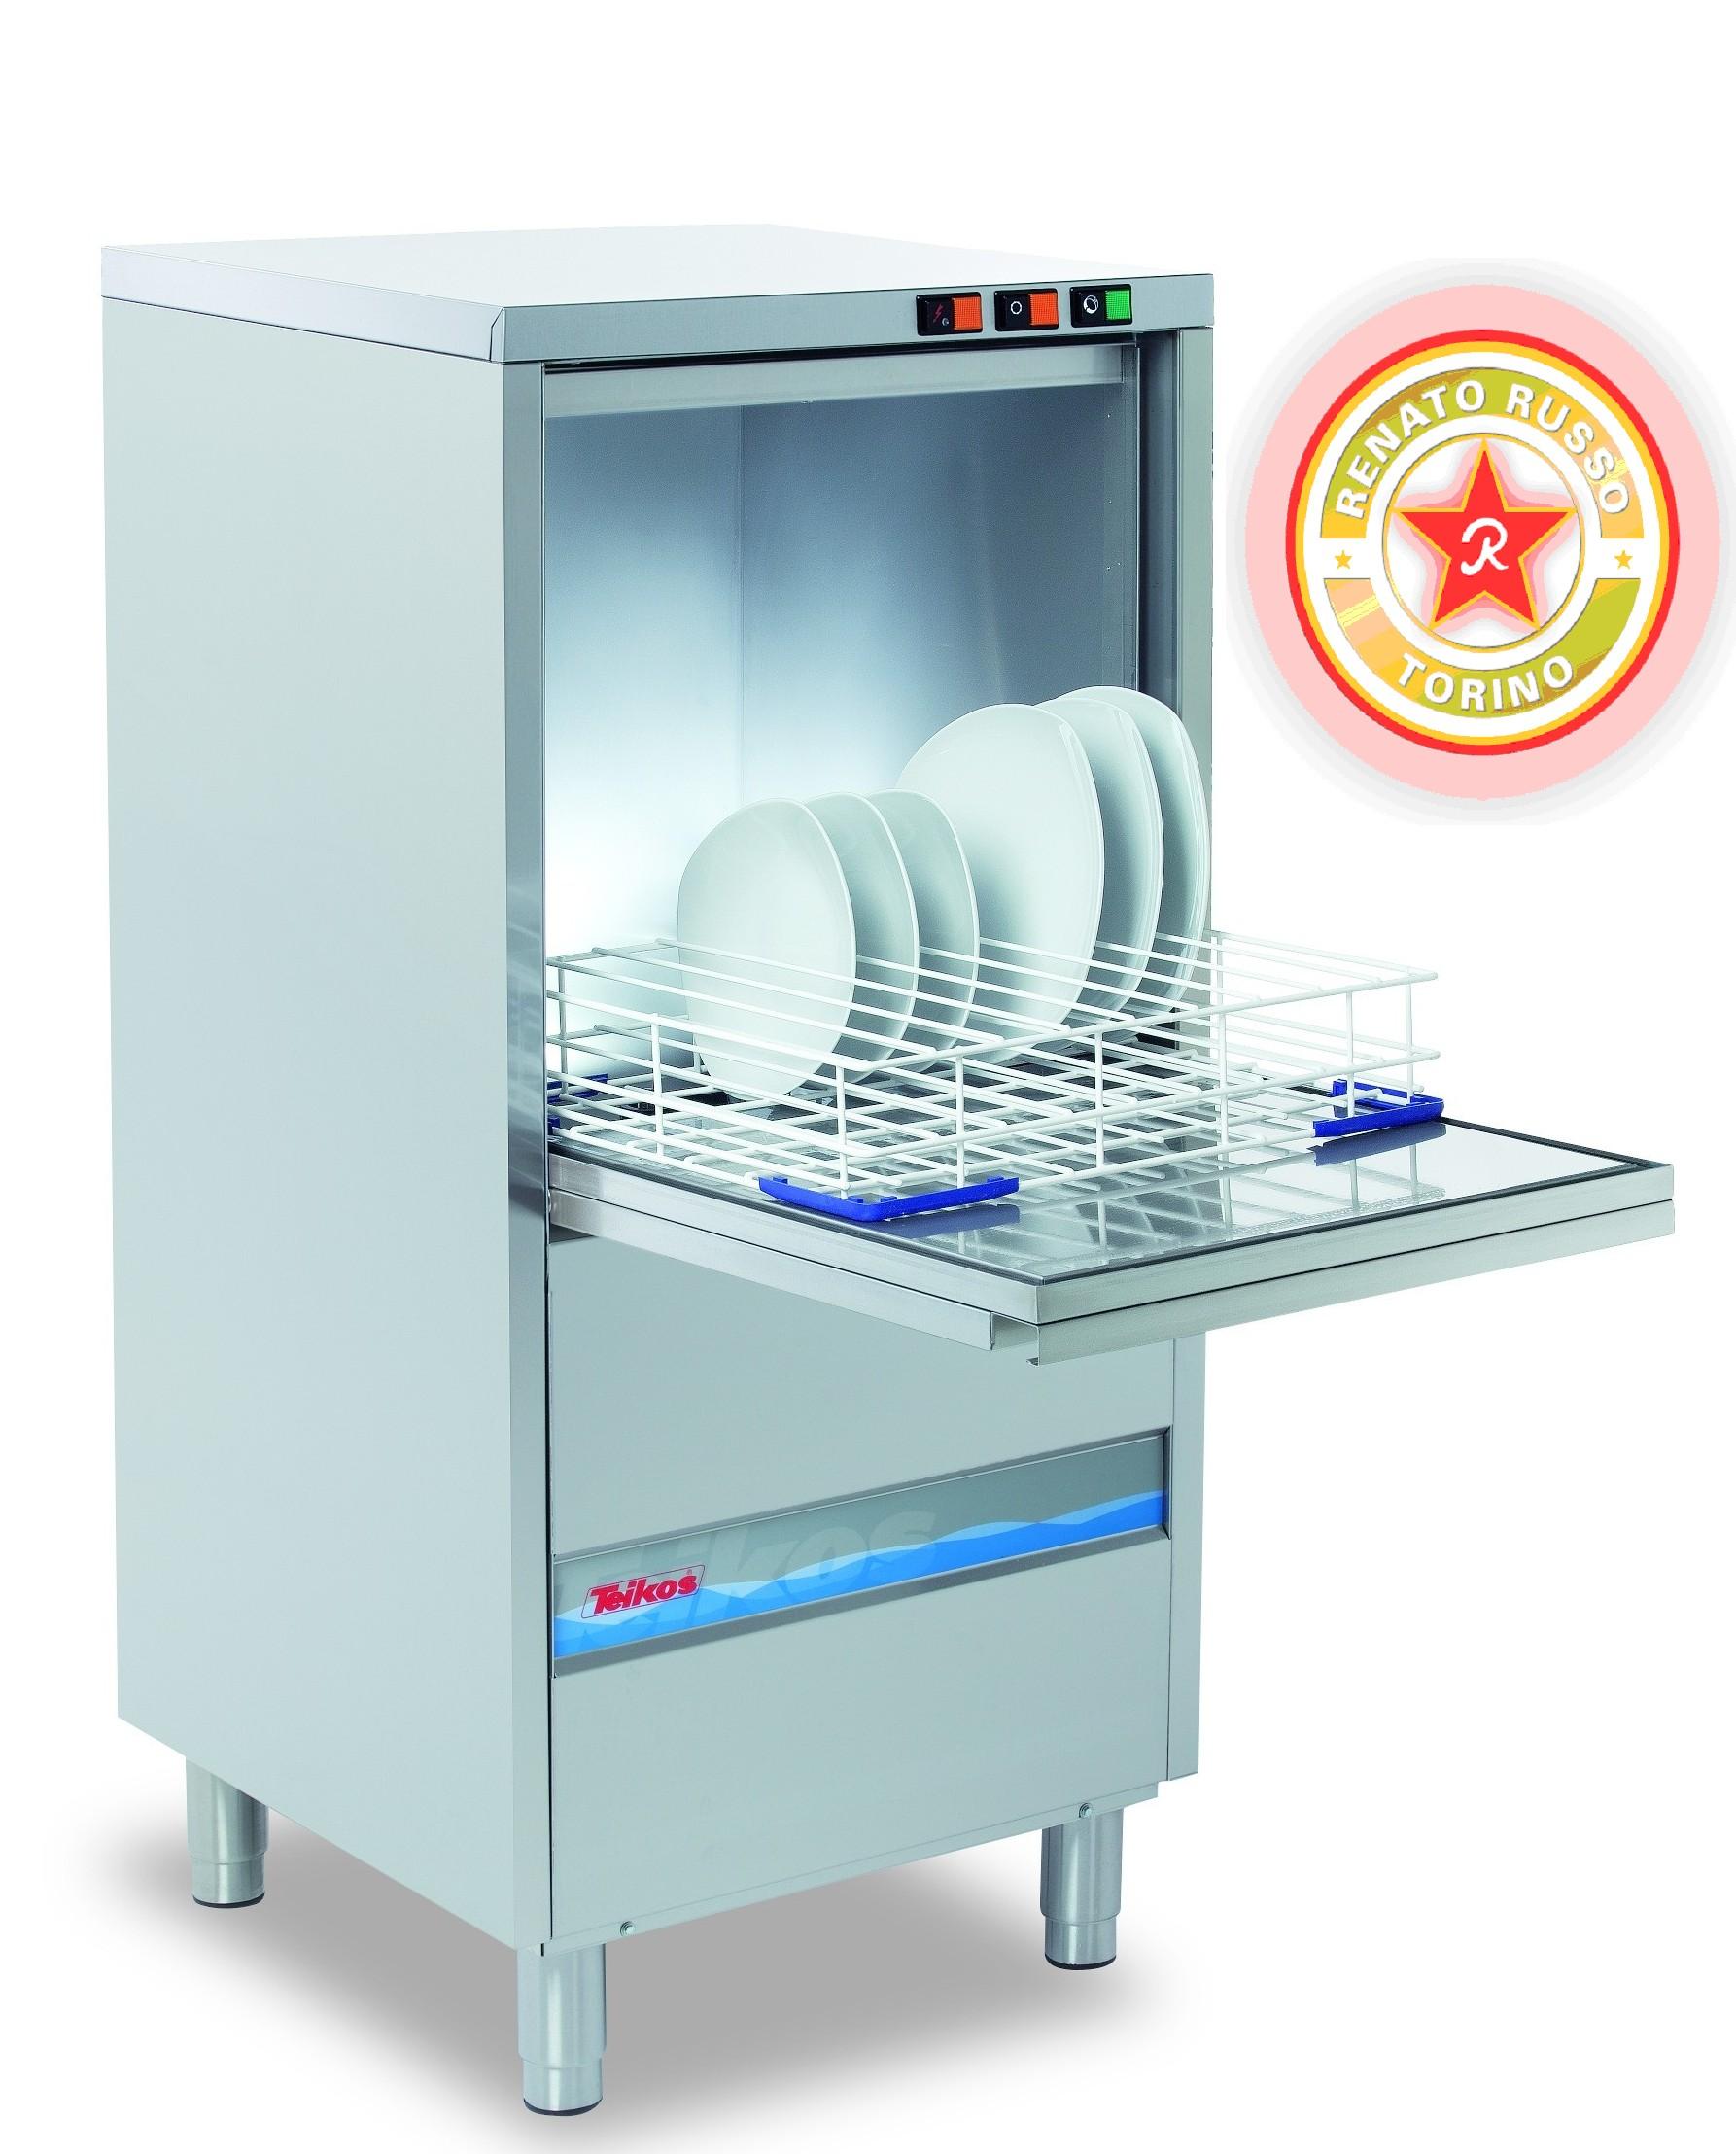 lavastoviglie professionale cm.60x60xh130. Volt.220